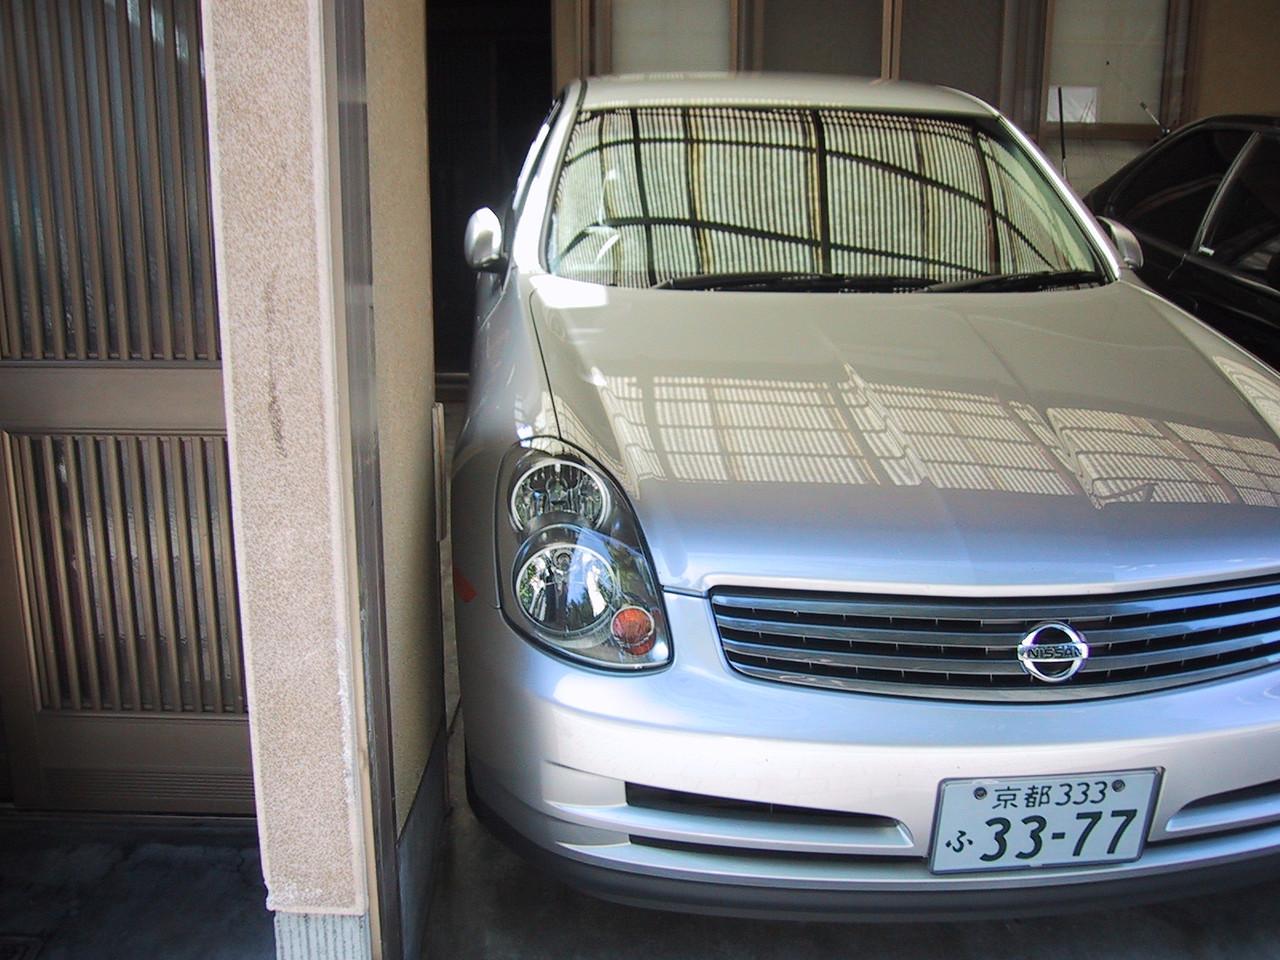 Kyoto, Japan, August 2002